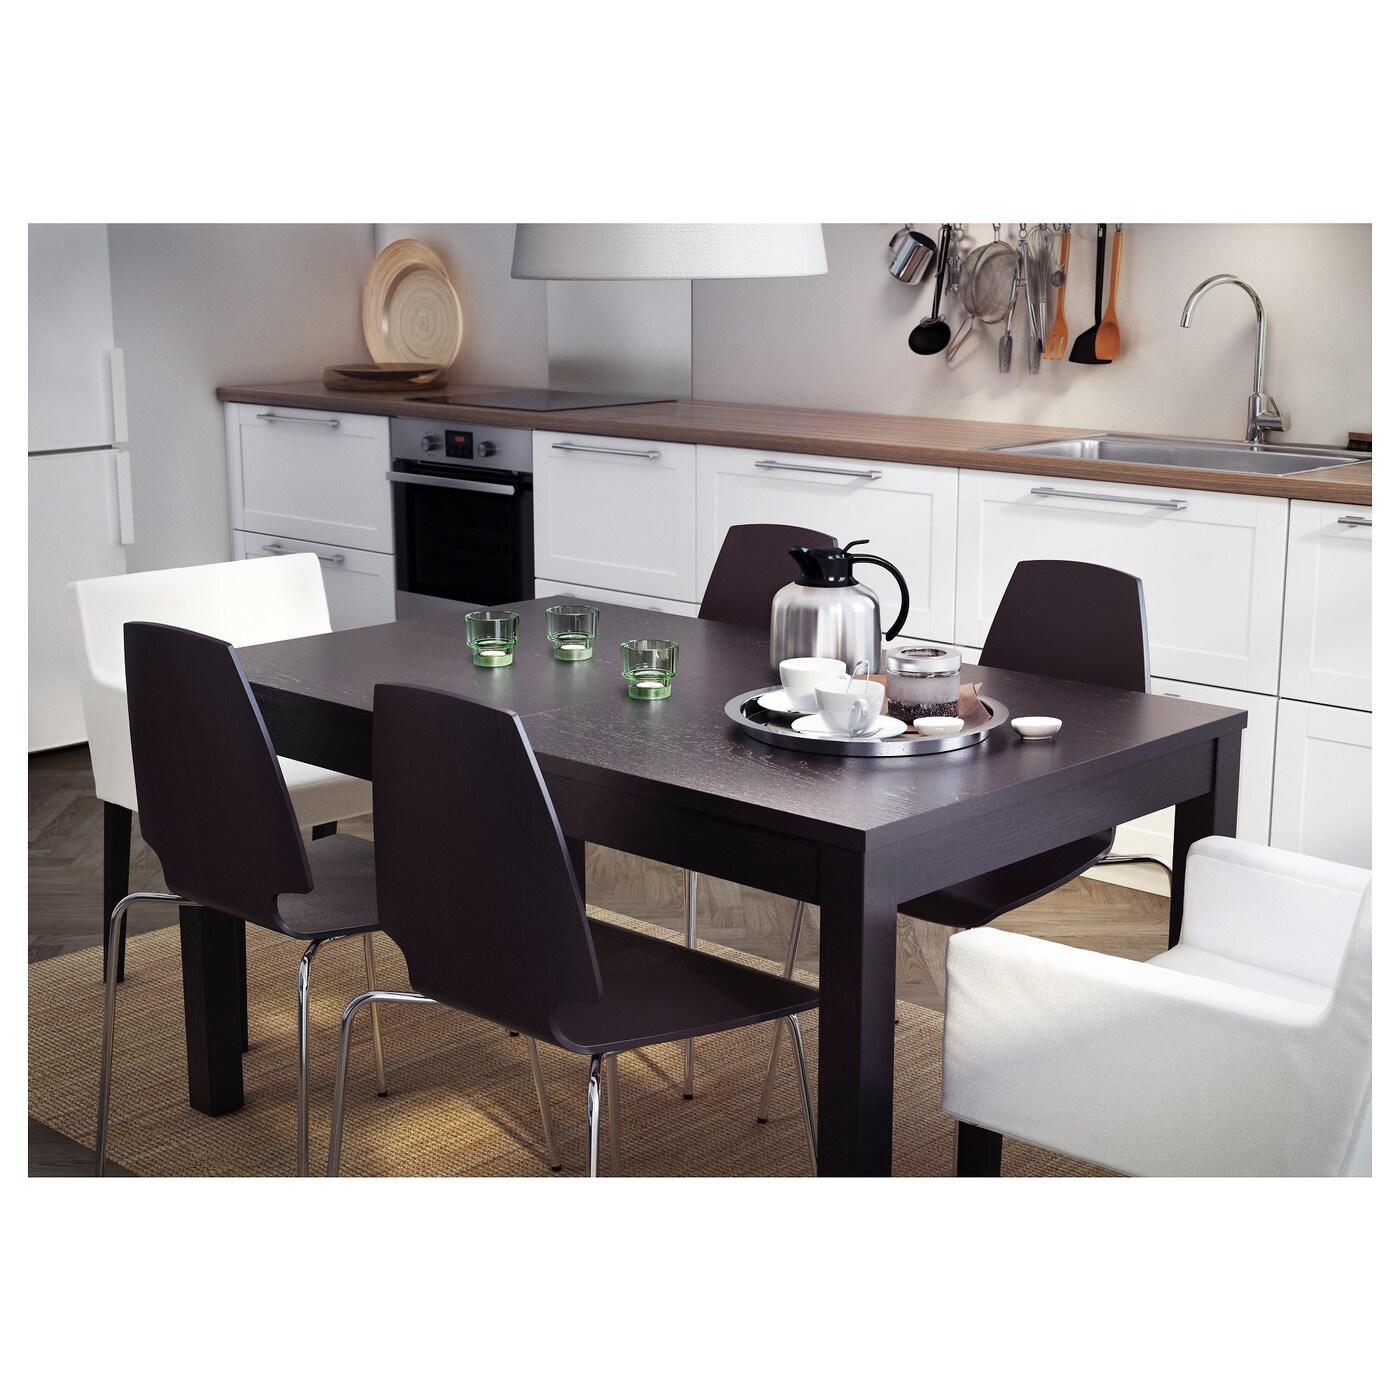 Extendable Table bjursta extendable table brown-black 140/180/220x84 cm - ikea